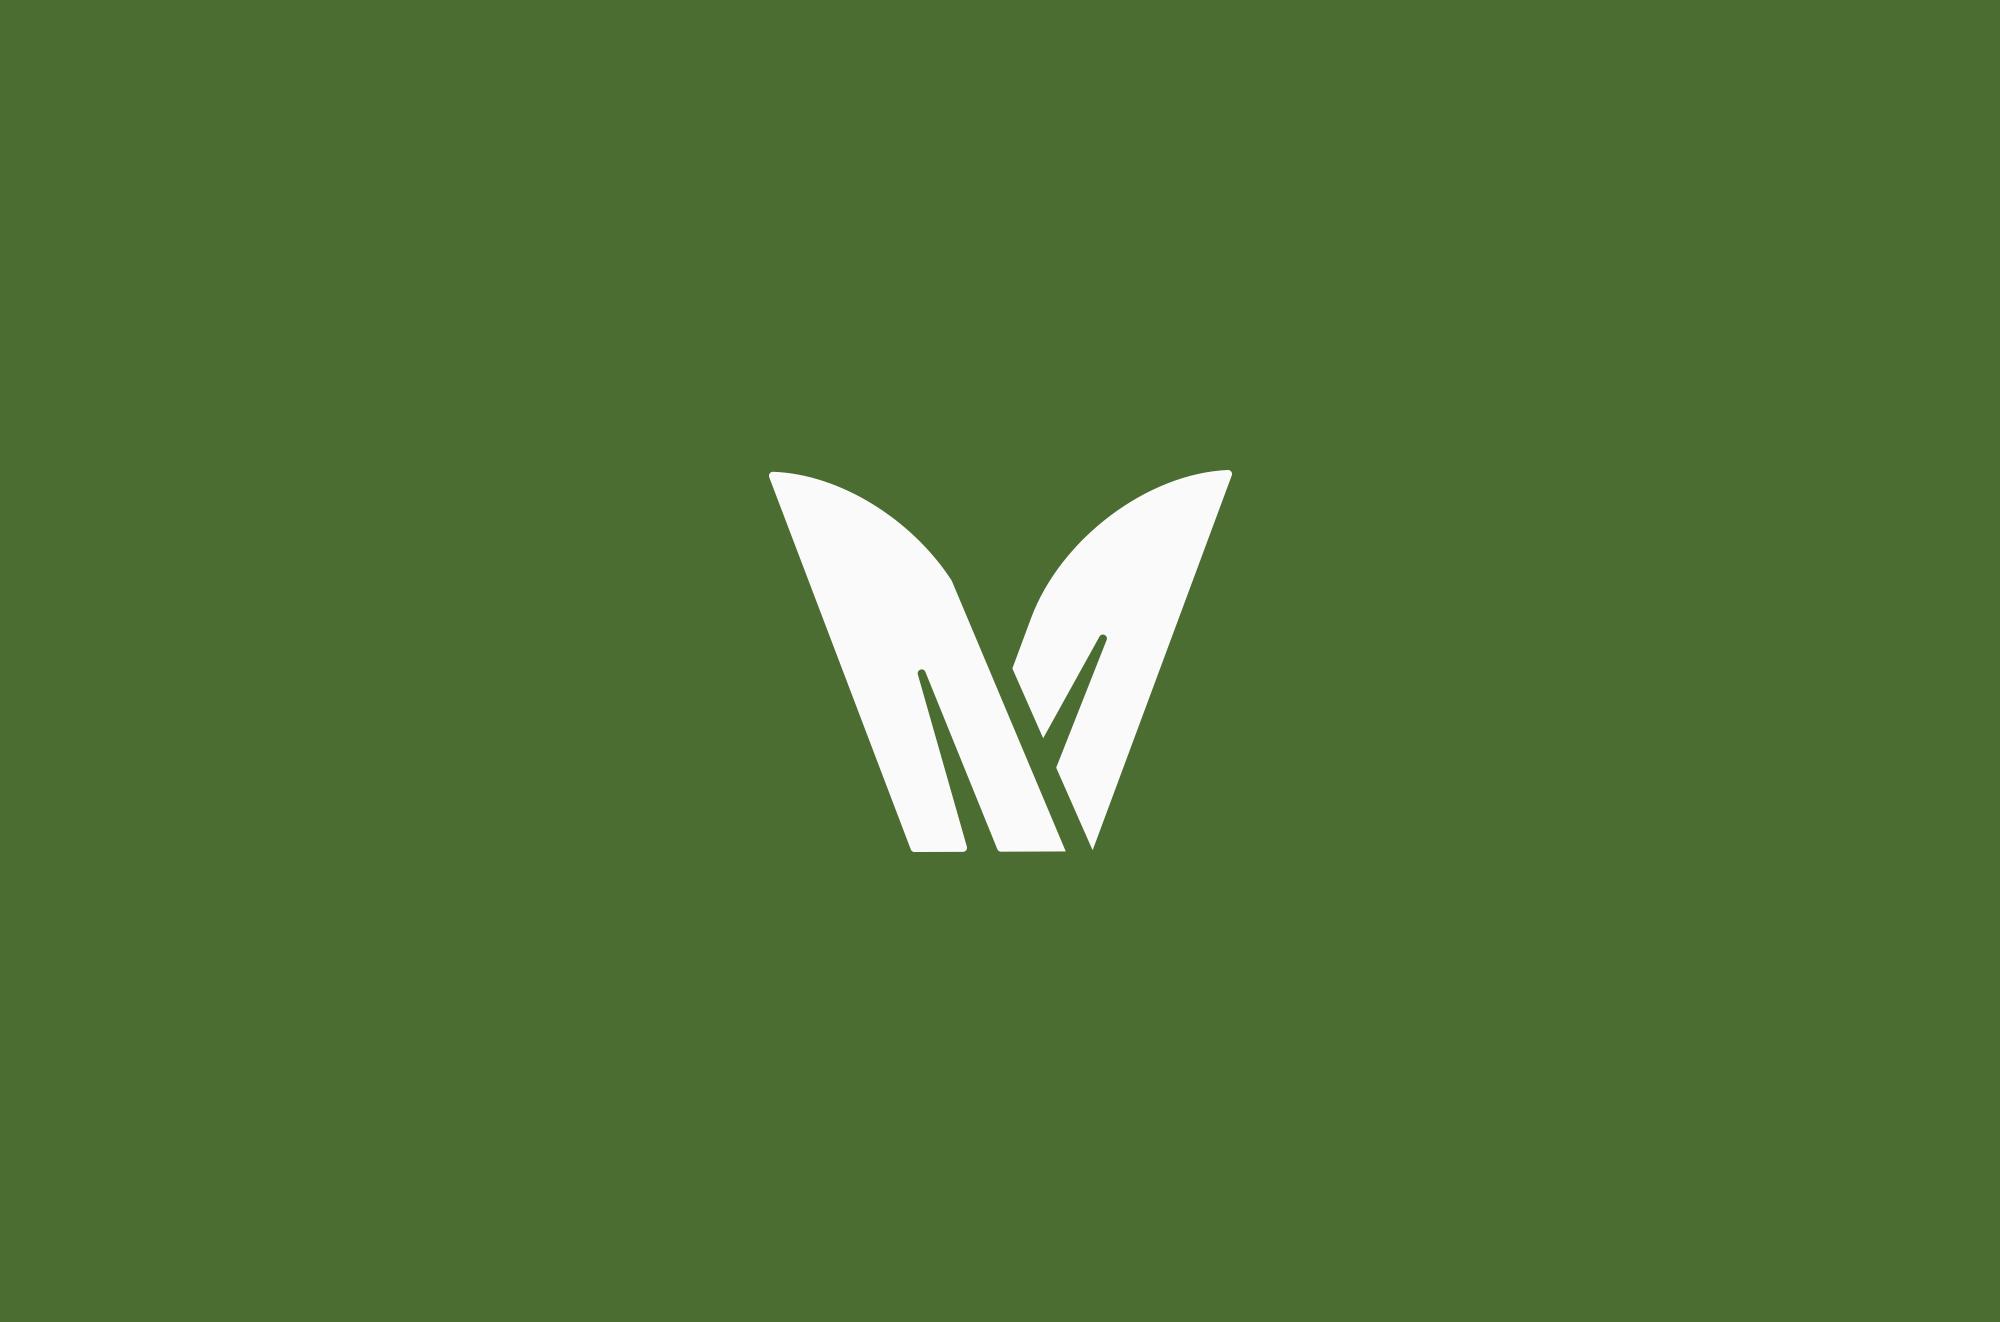 VL_NC_logo